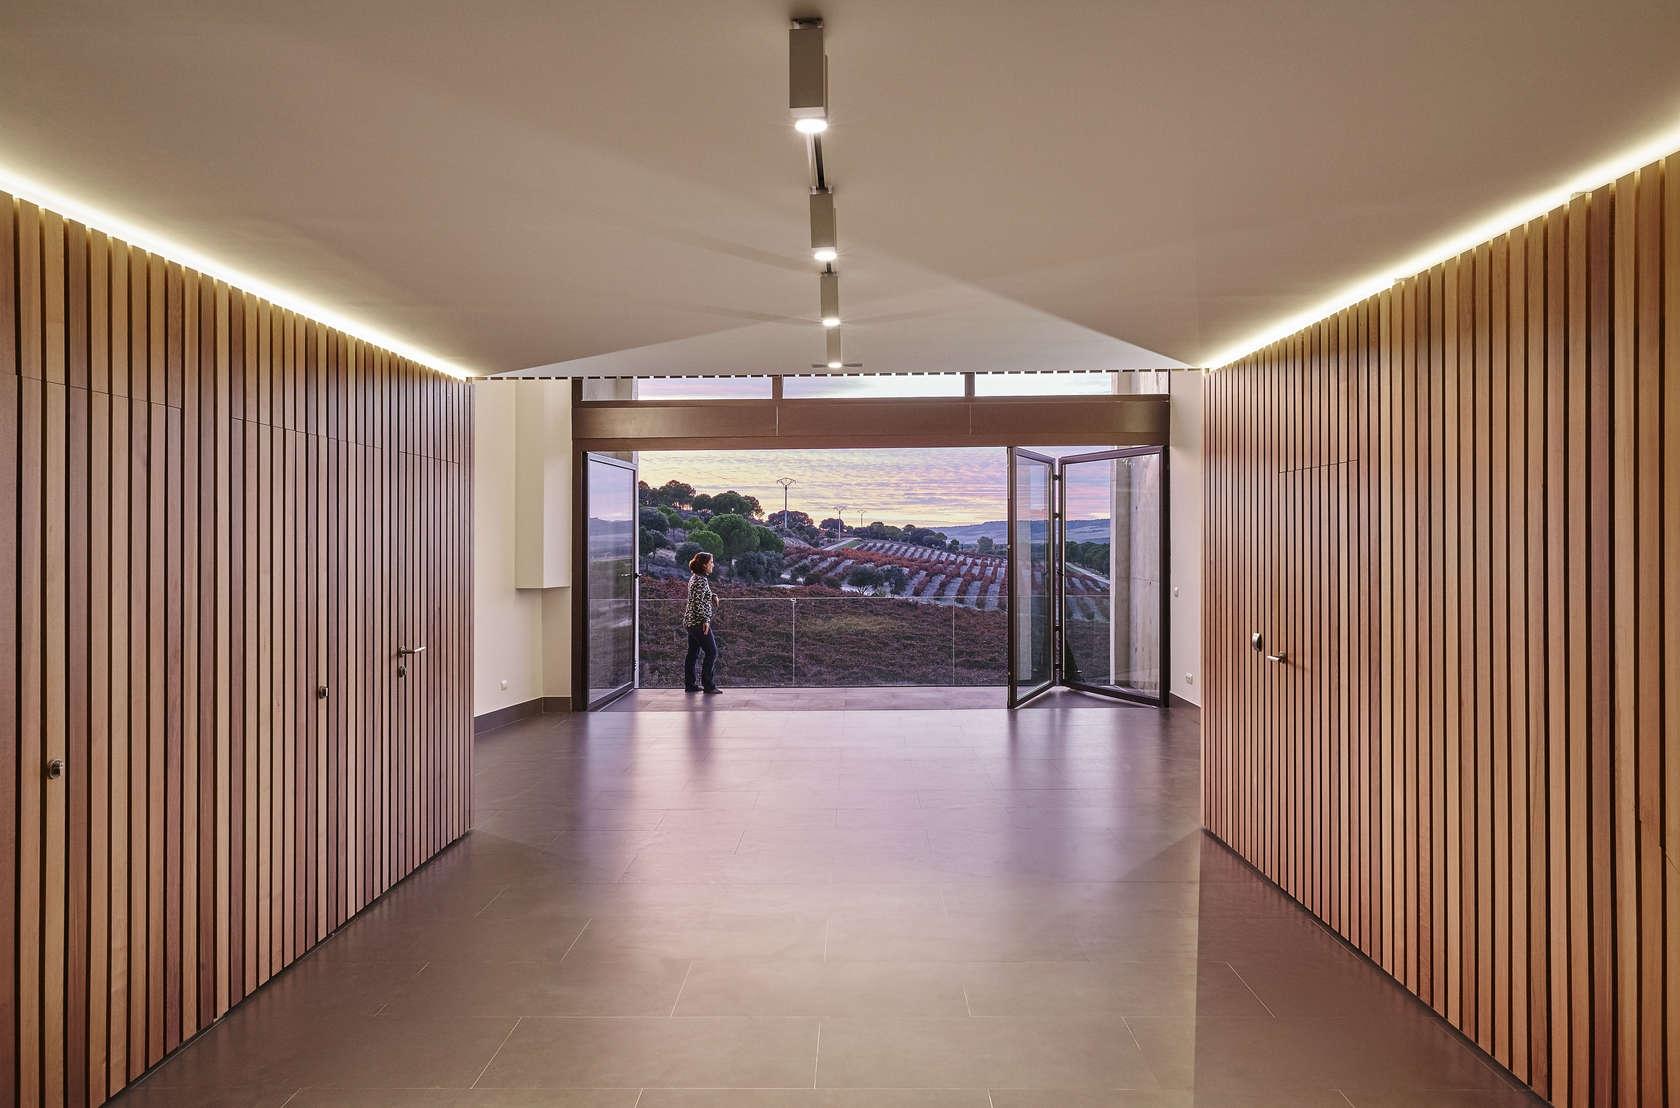 Bodega Valdemonjas Premios arquitectura Ana Agag Silvia Paredes9 1680x1108 c